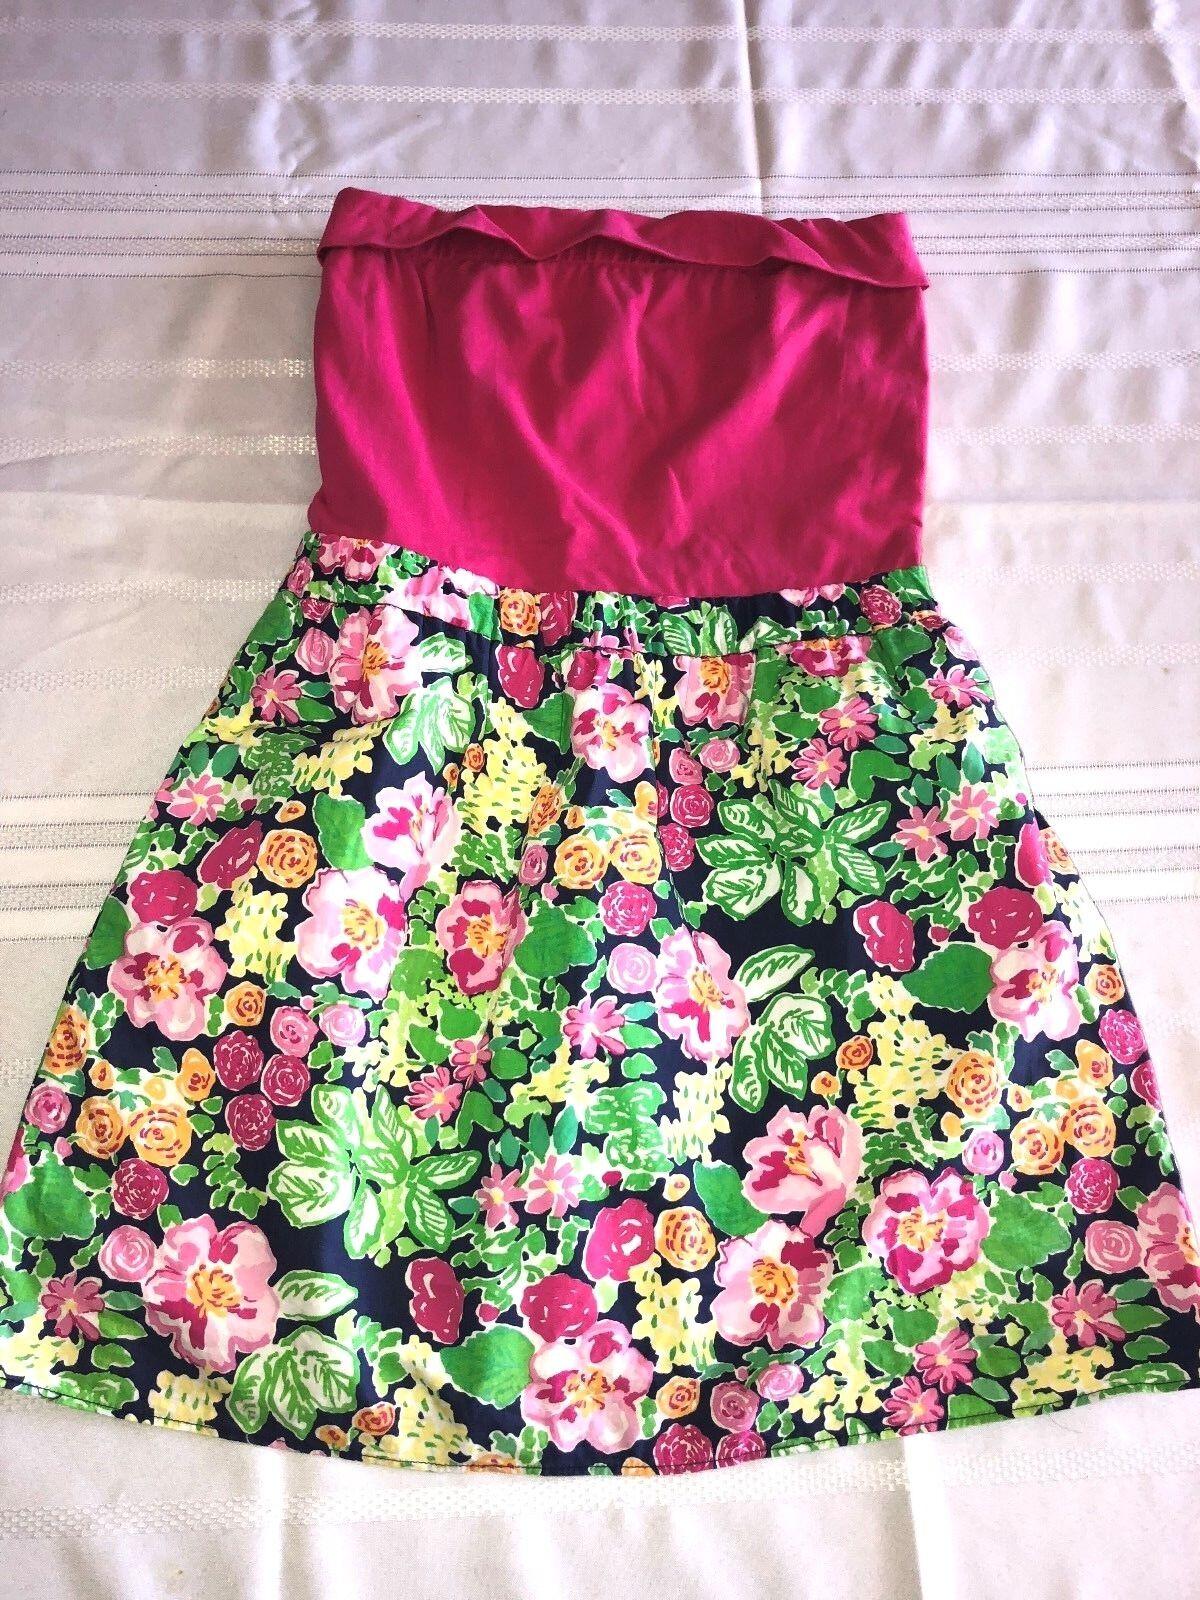 Lilly Pulitzer Esmeralda Fuchsia Jersey & Floral Print Strapless Dress S Small